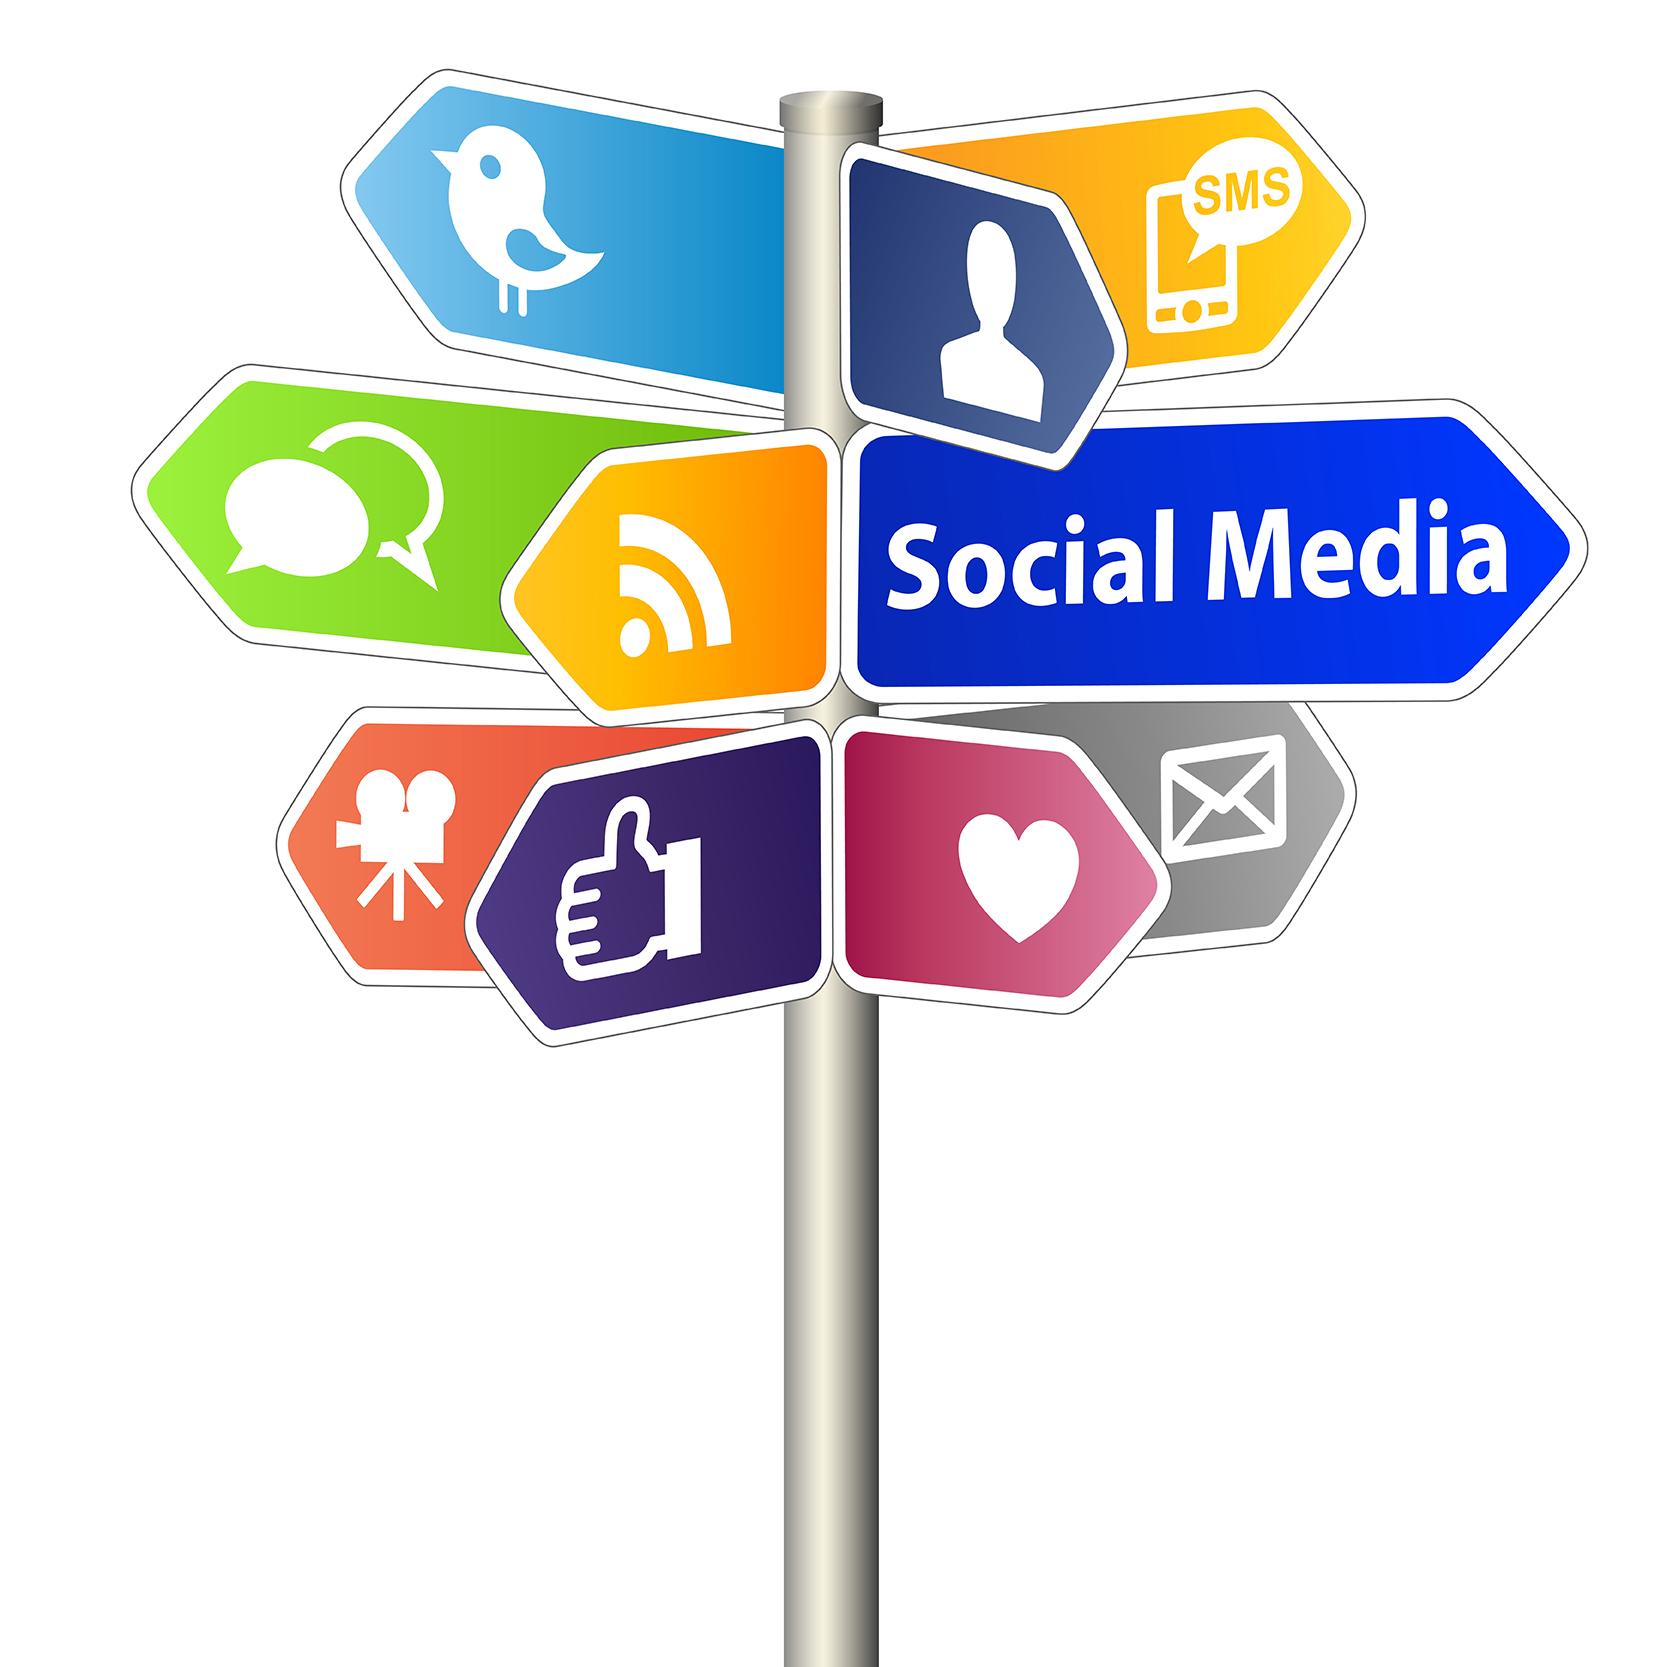 bigstock-Social-Media-Sign-28292228